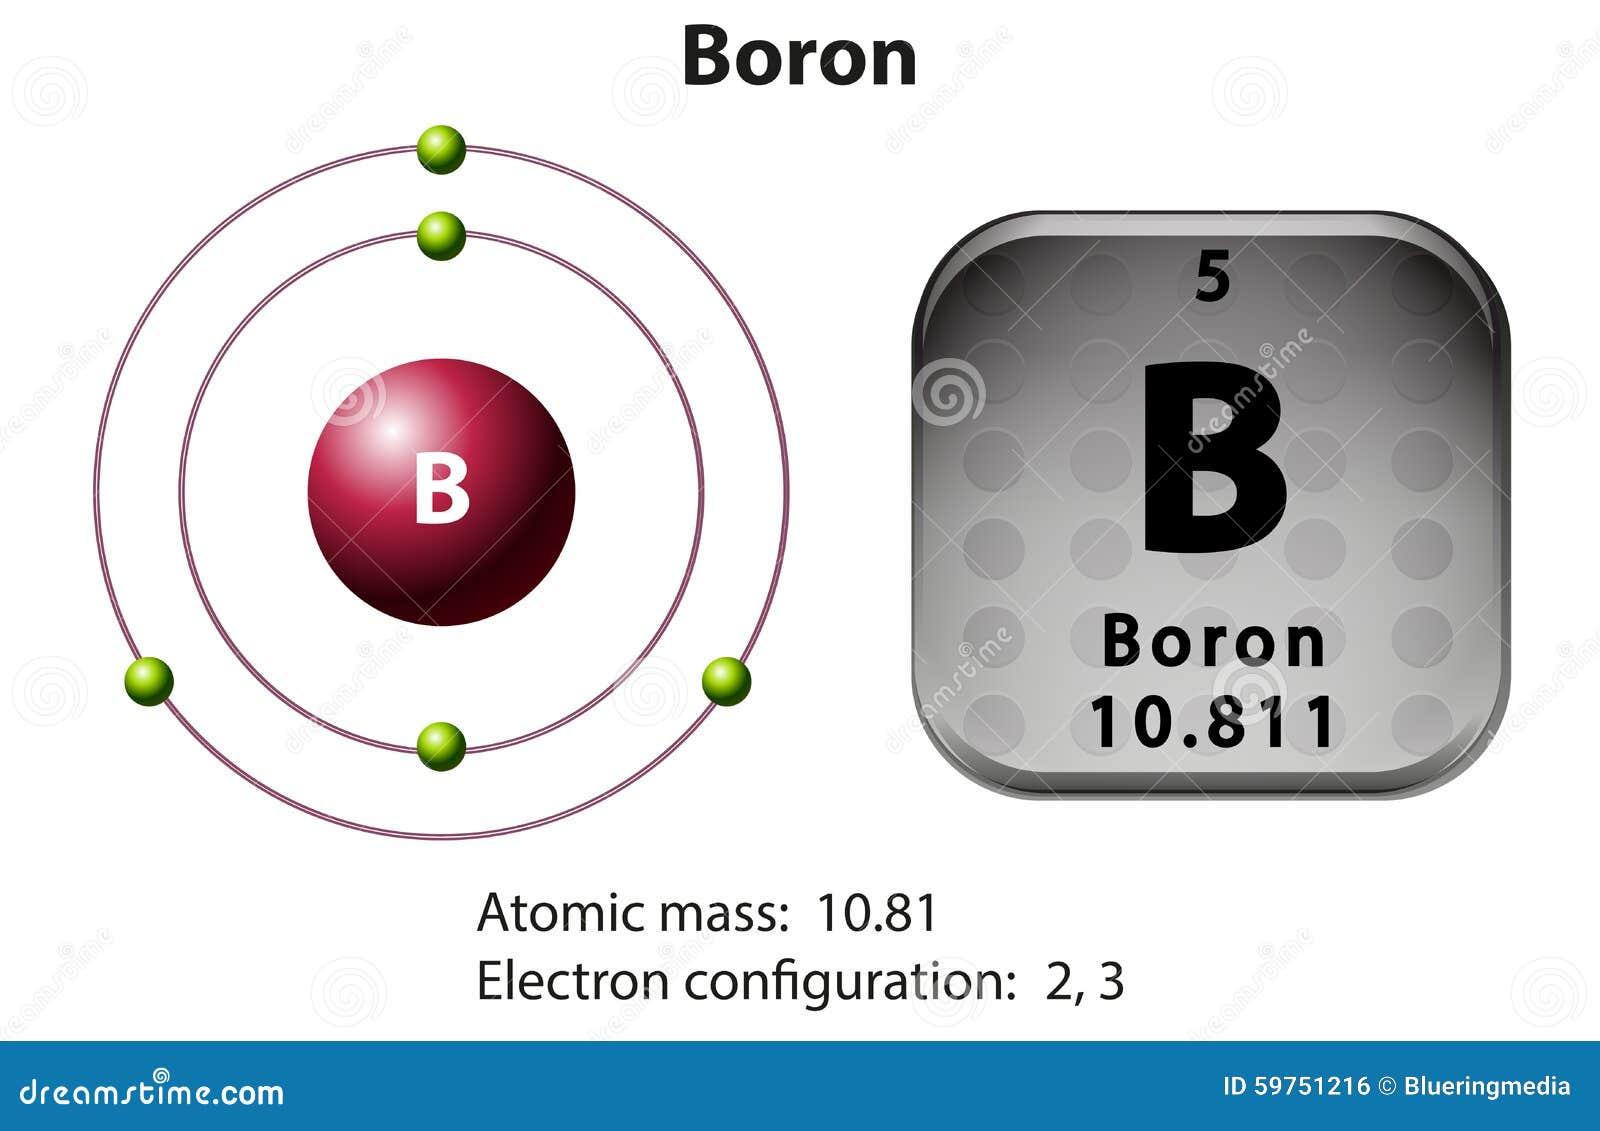 Boron Atom Diagram 3d Render Illustration Stock Photos Structure Of Oxygen Unlabelled Http Www Micromountain Com Sci Diagrams Download